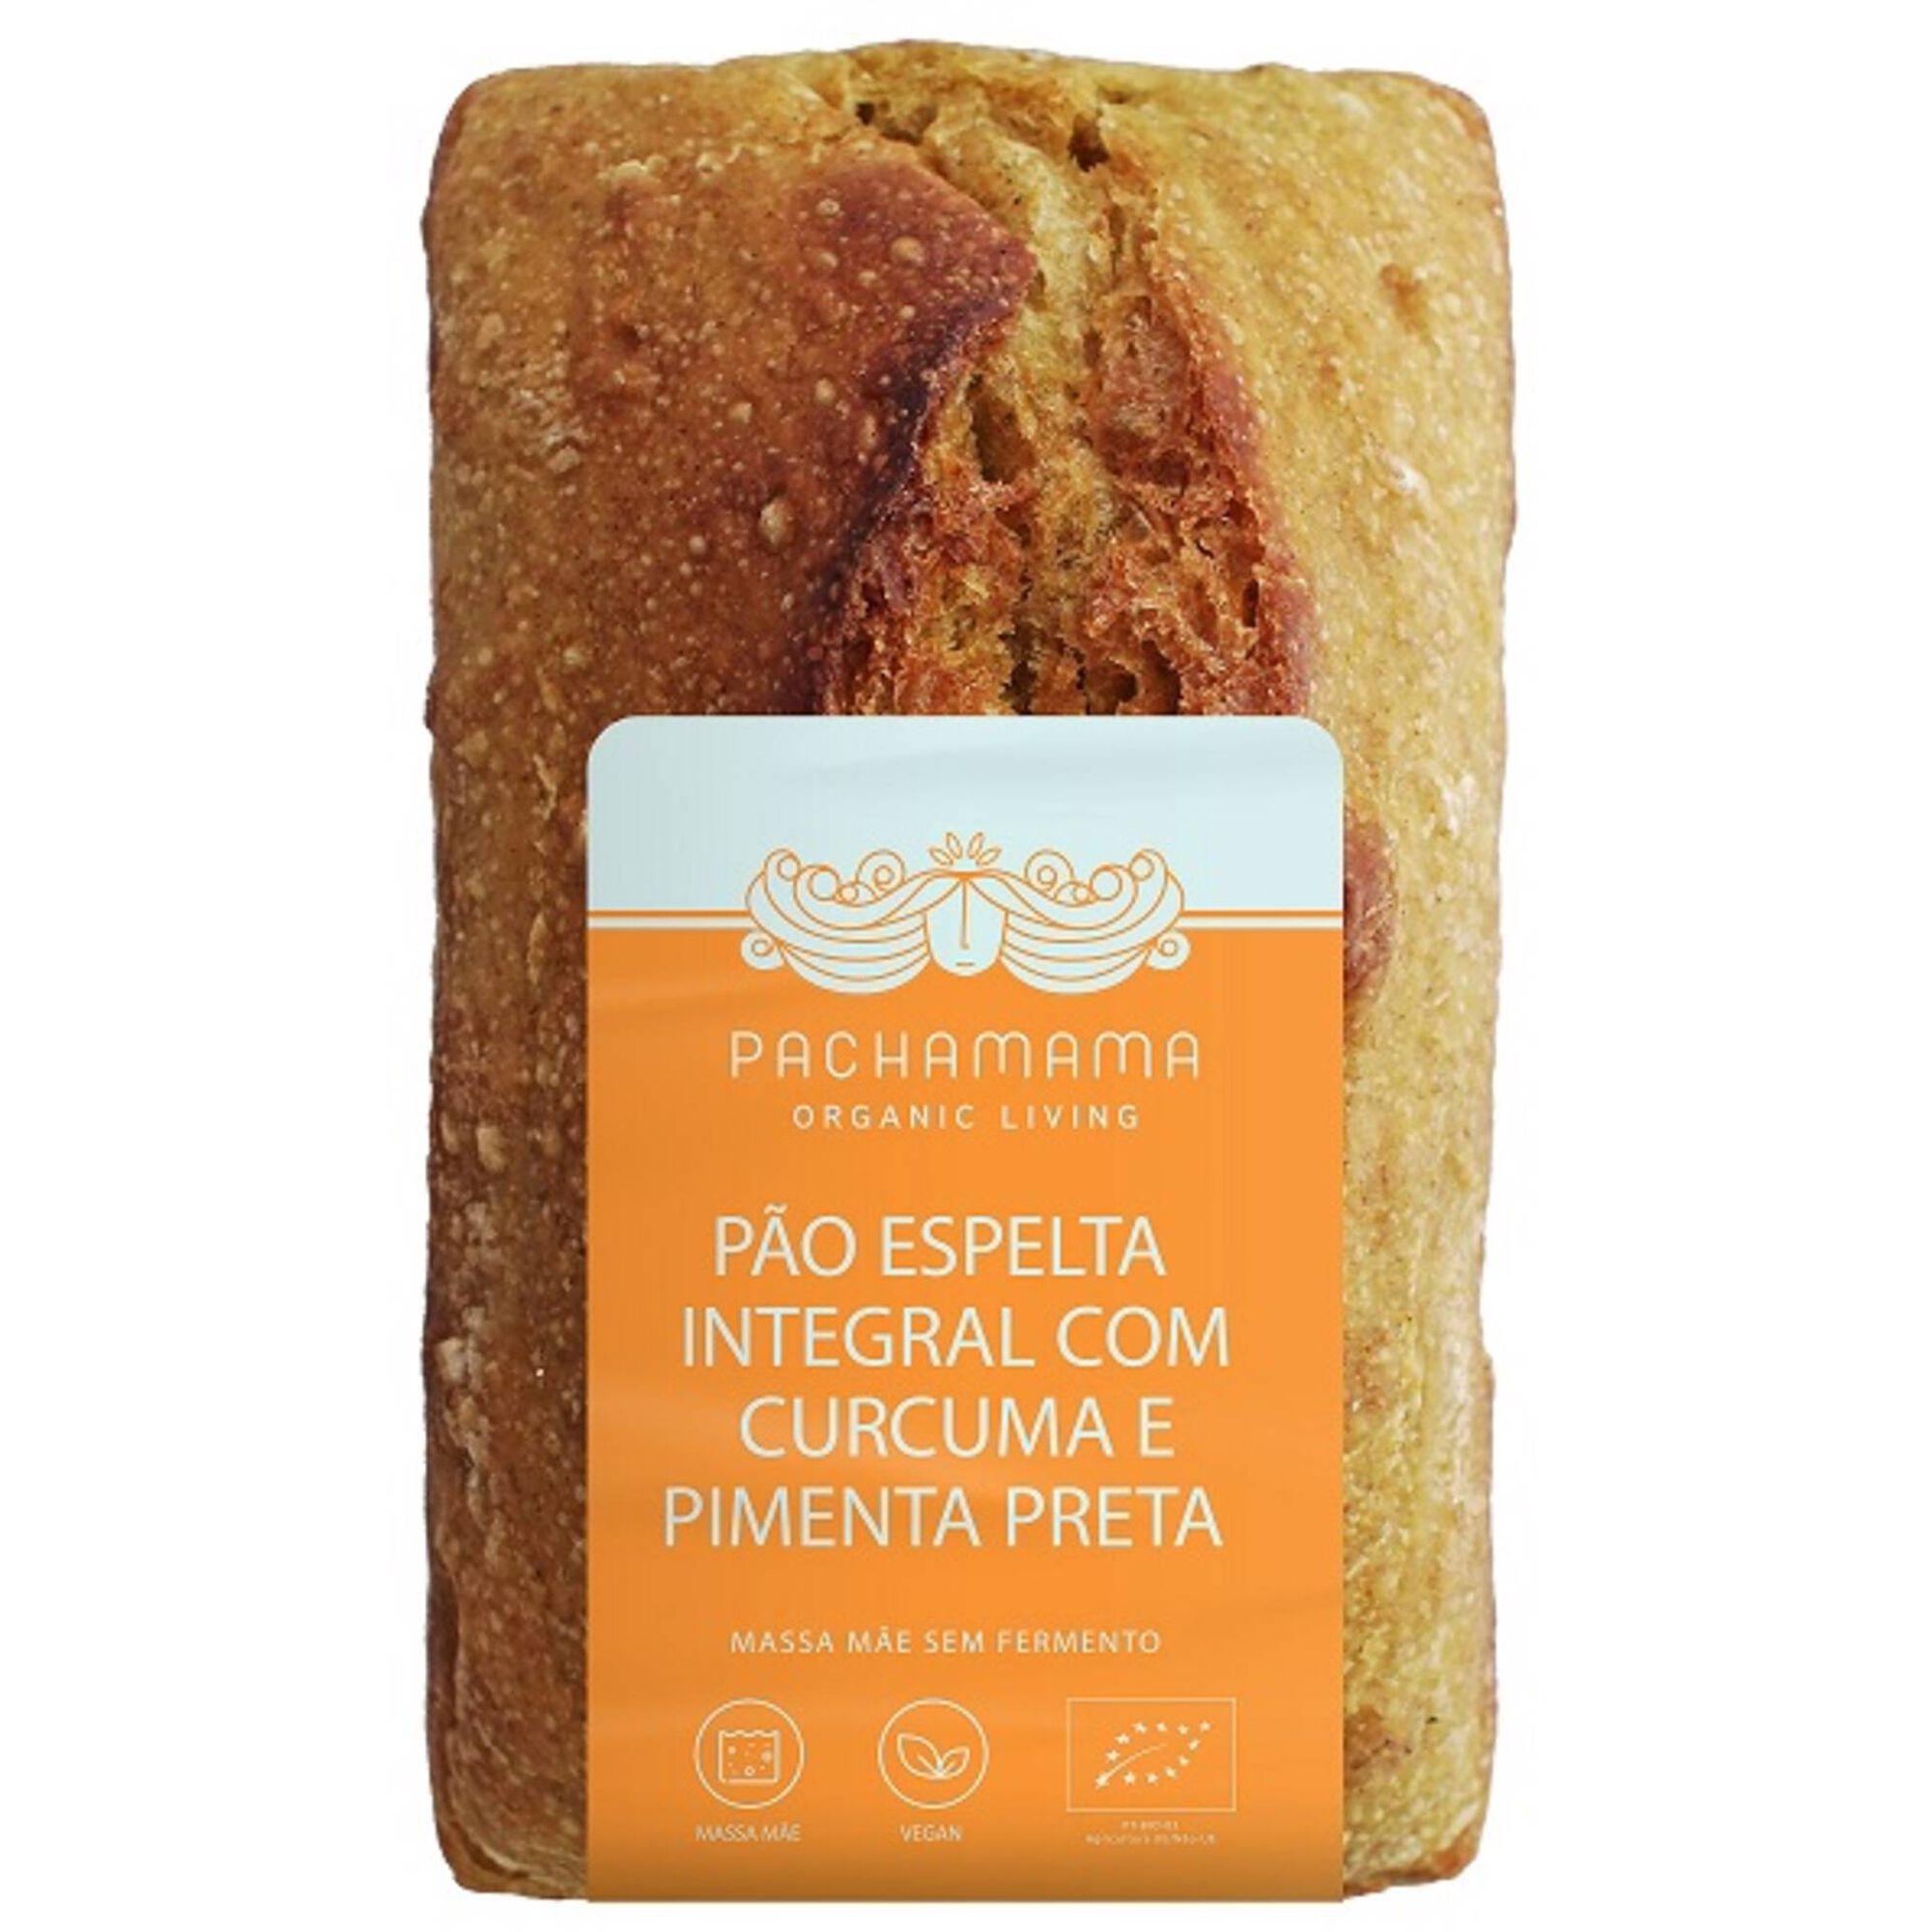 Pão Espelta Integral Curcuma e Pimenta Preta